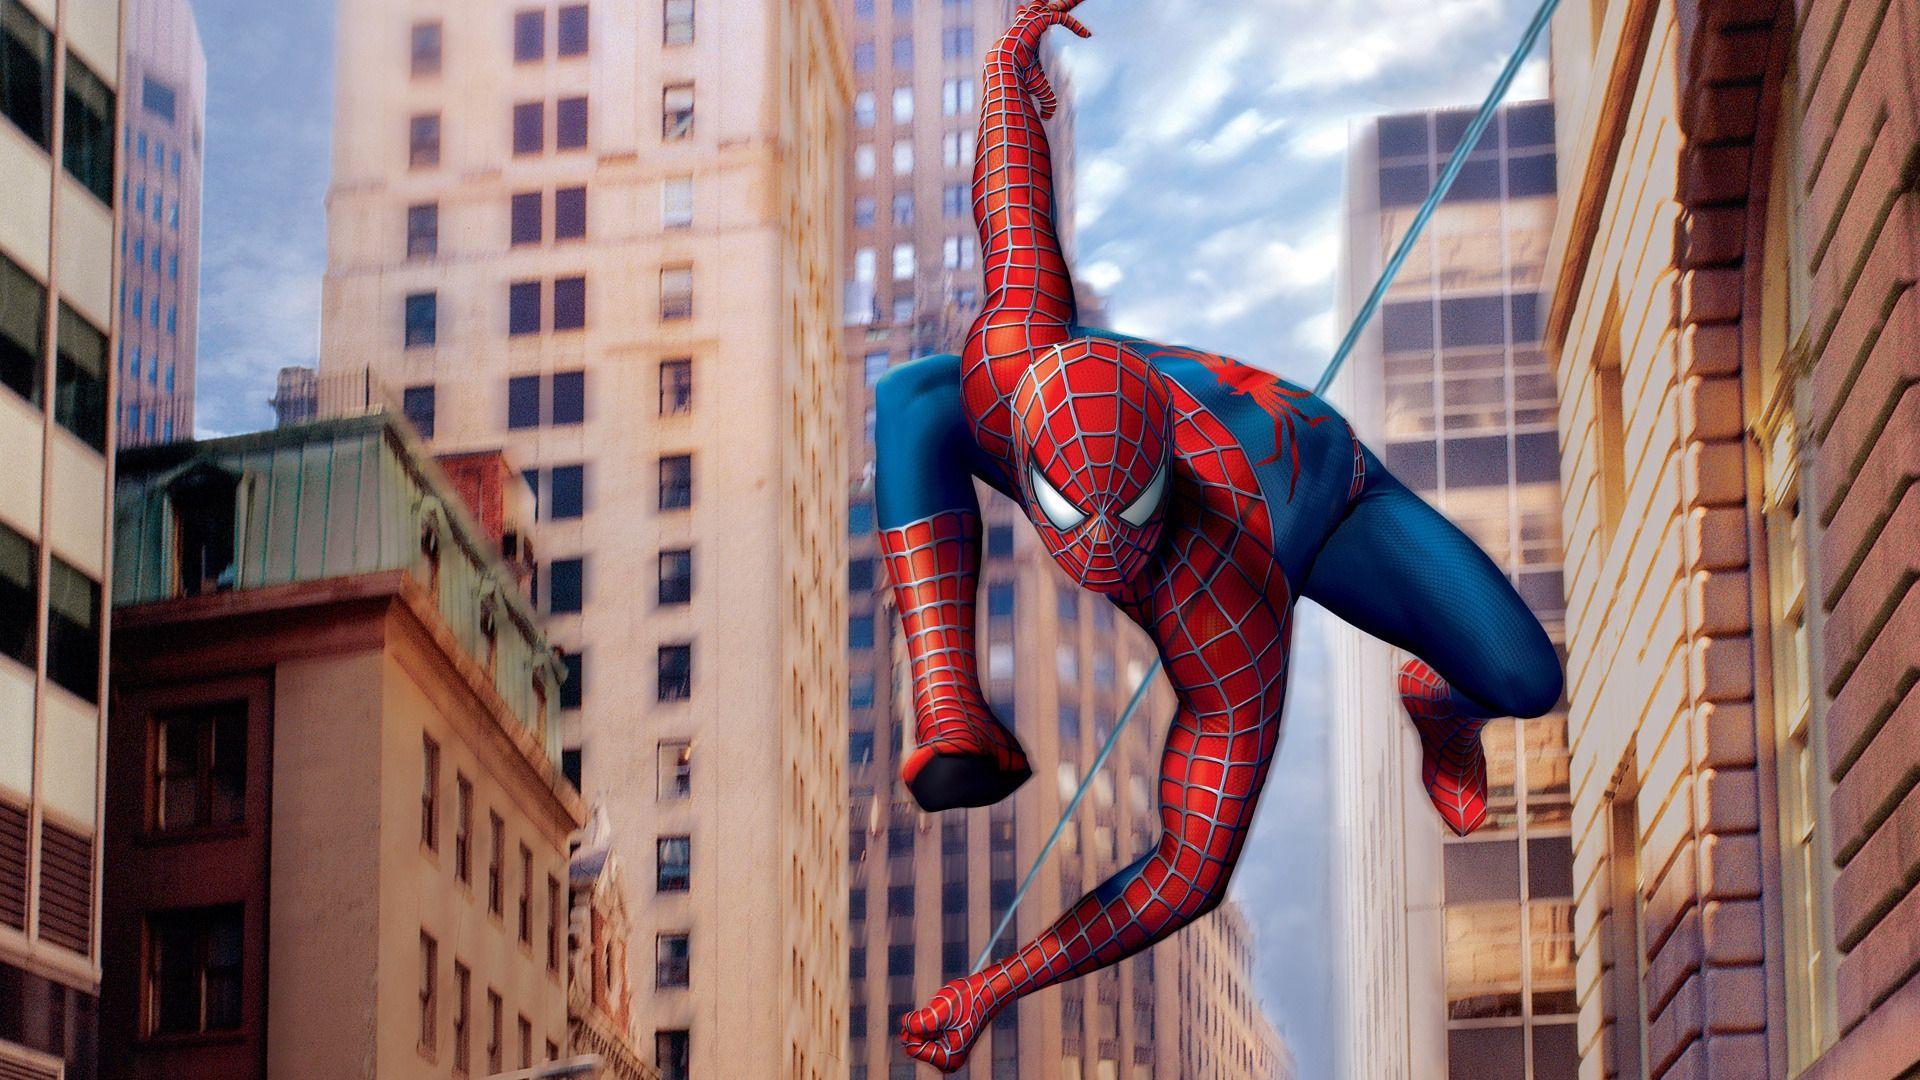 28 Amazing Spiderman Hd Wallpapers Wallpaperboat